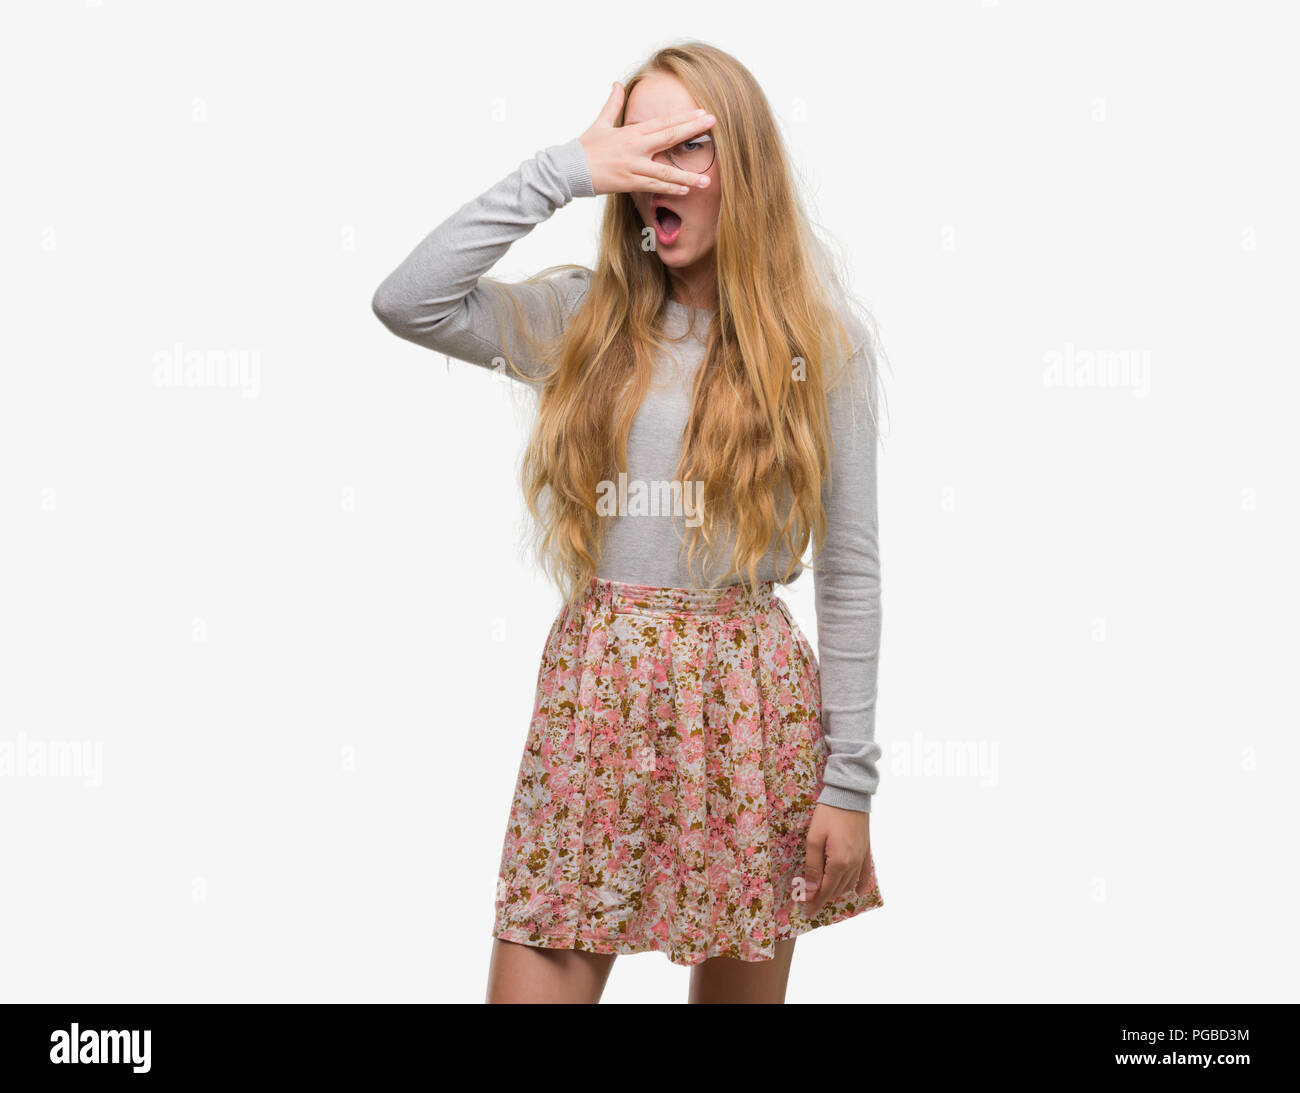 Embarrassed blonde teen